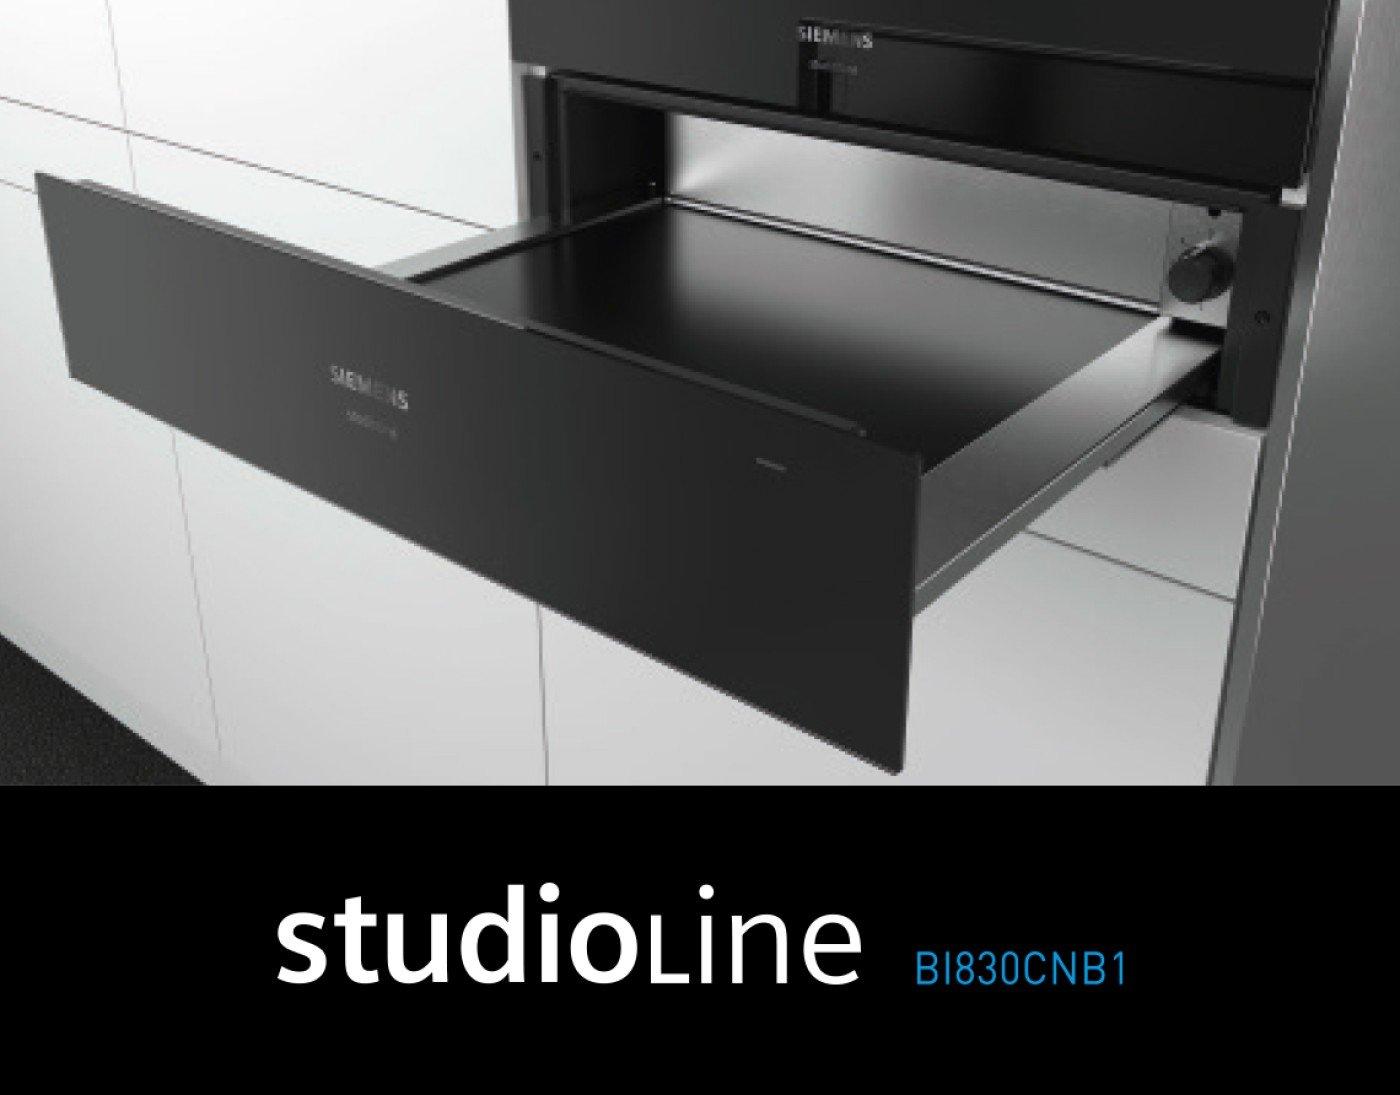 Optionale Wärmeschublade – Studioline BI830CNB1